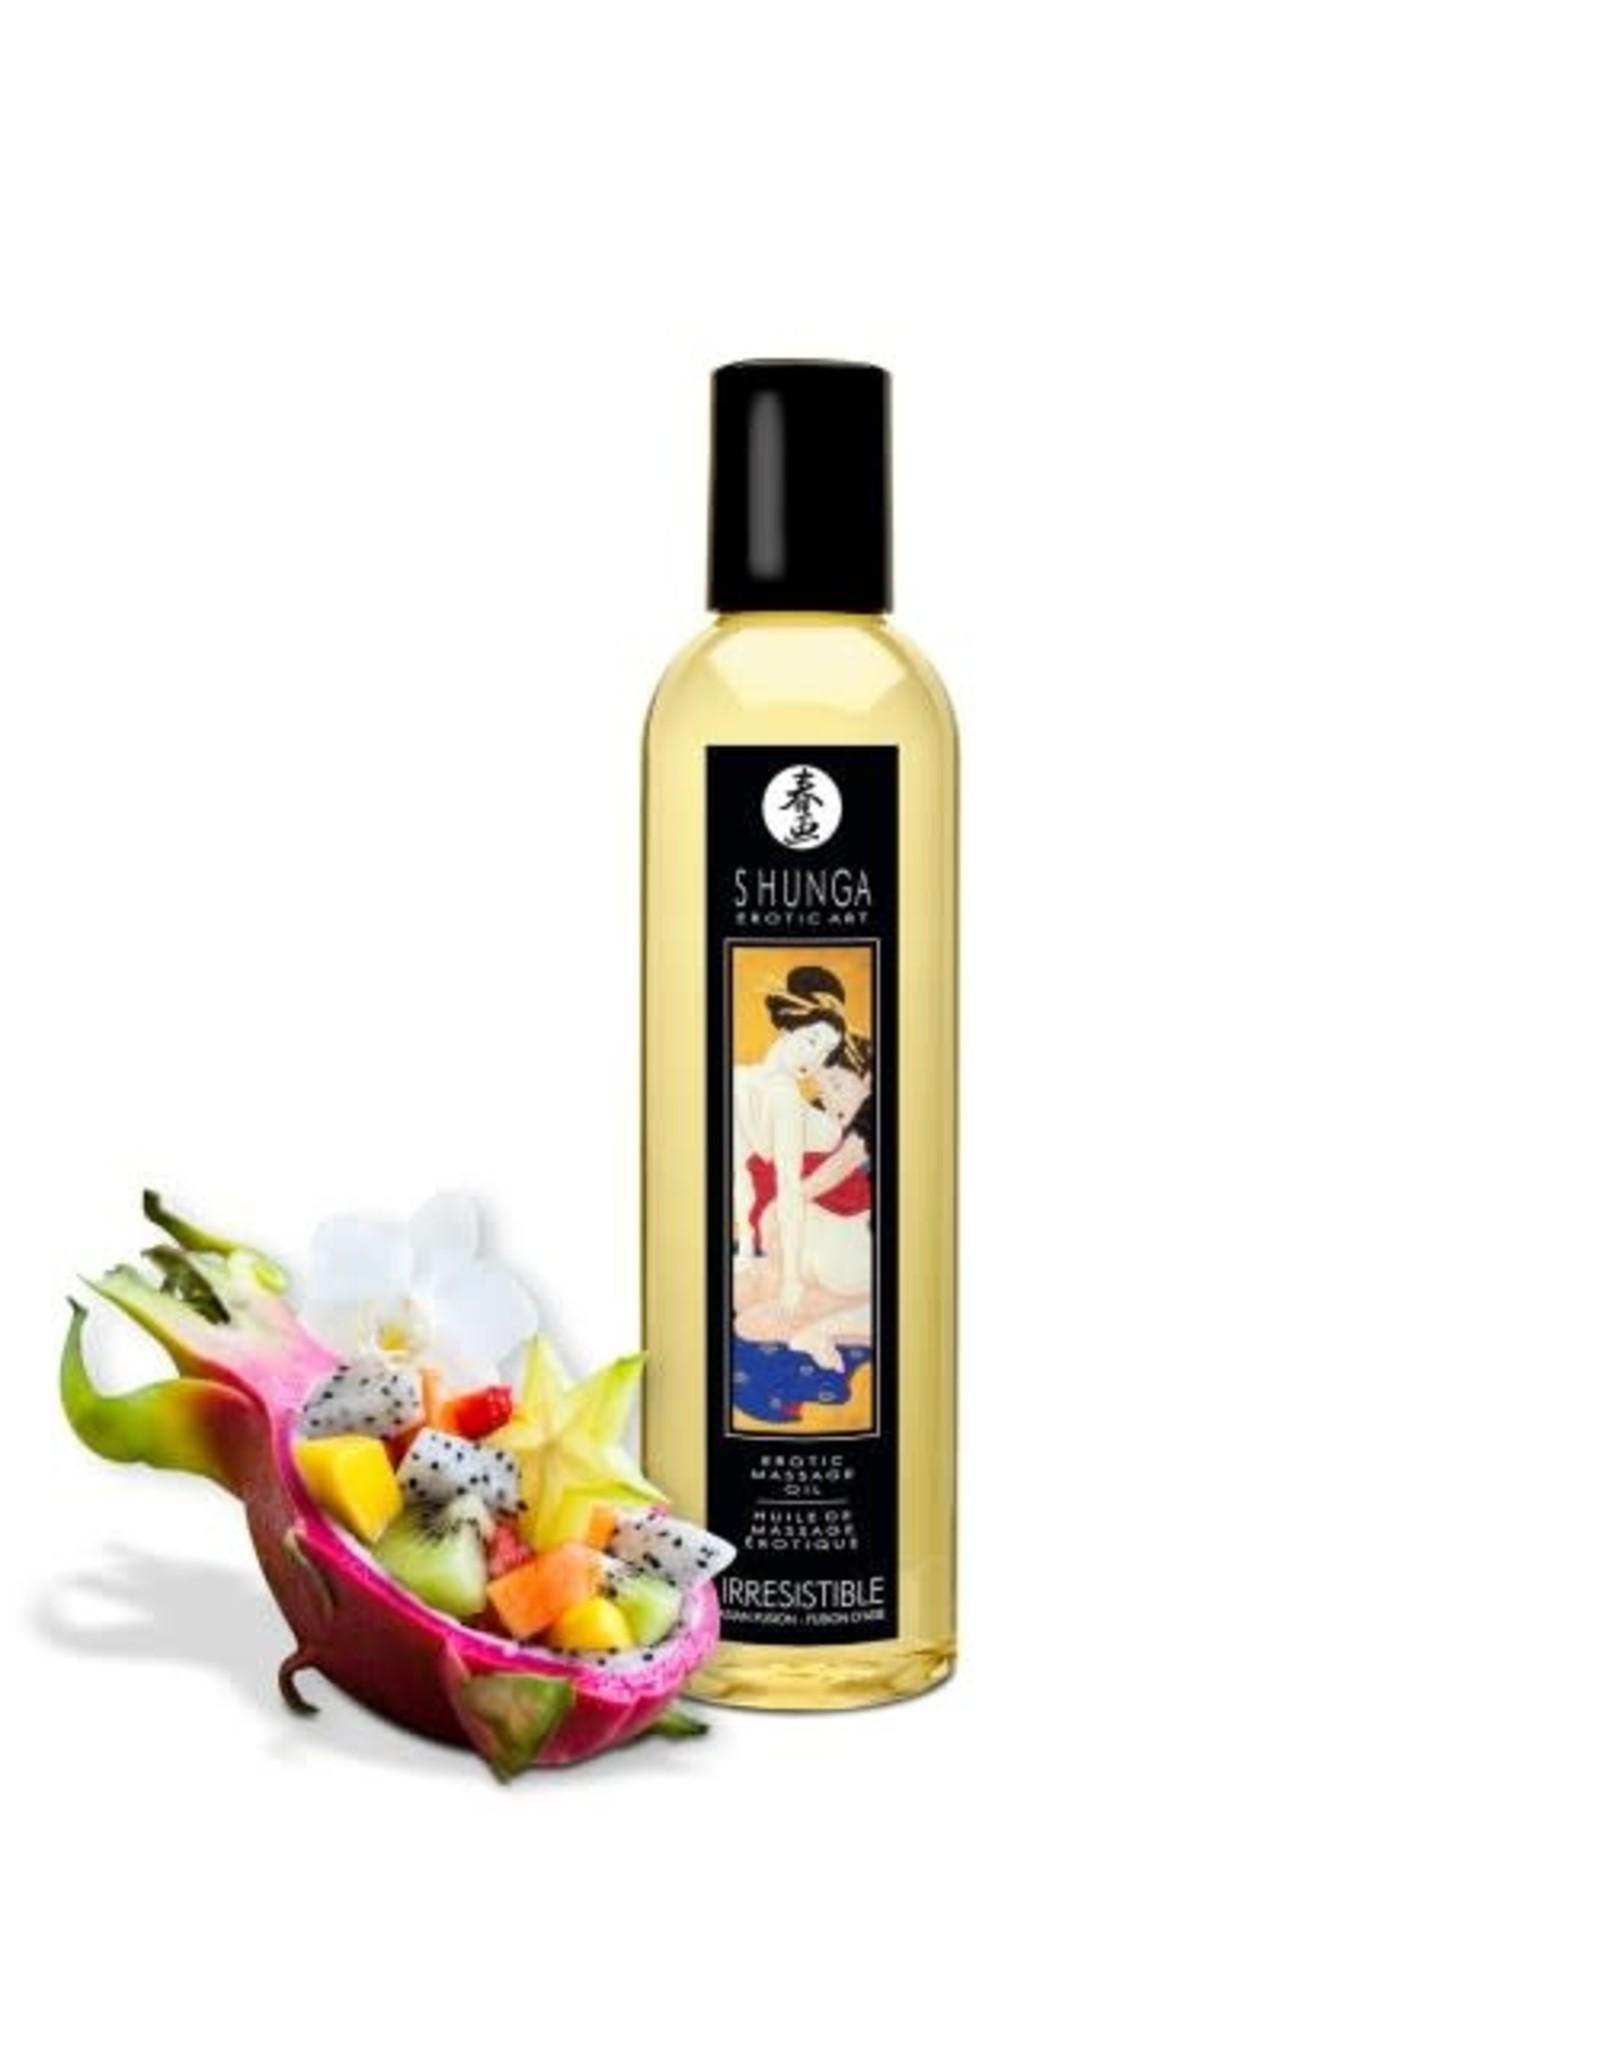 Shunga Shunga - Erotic Massage Oil - Irresistible - Asian Fusion